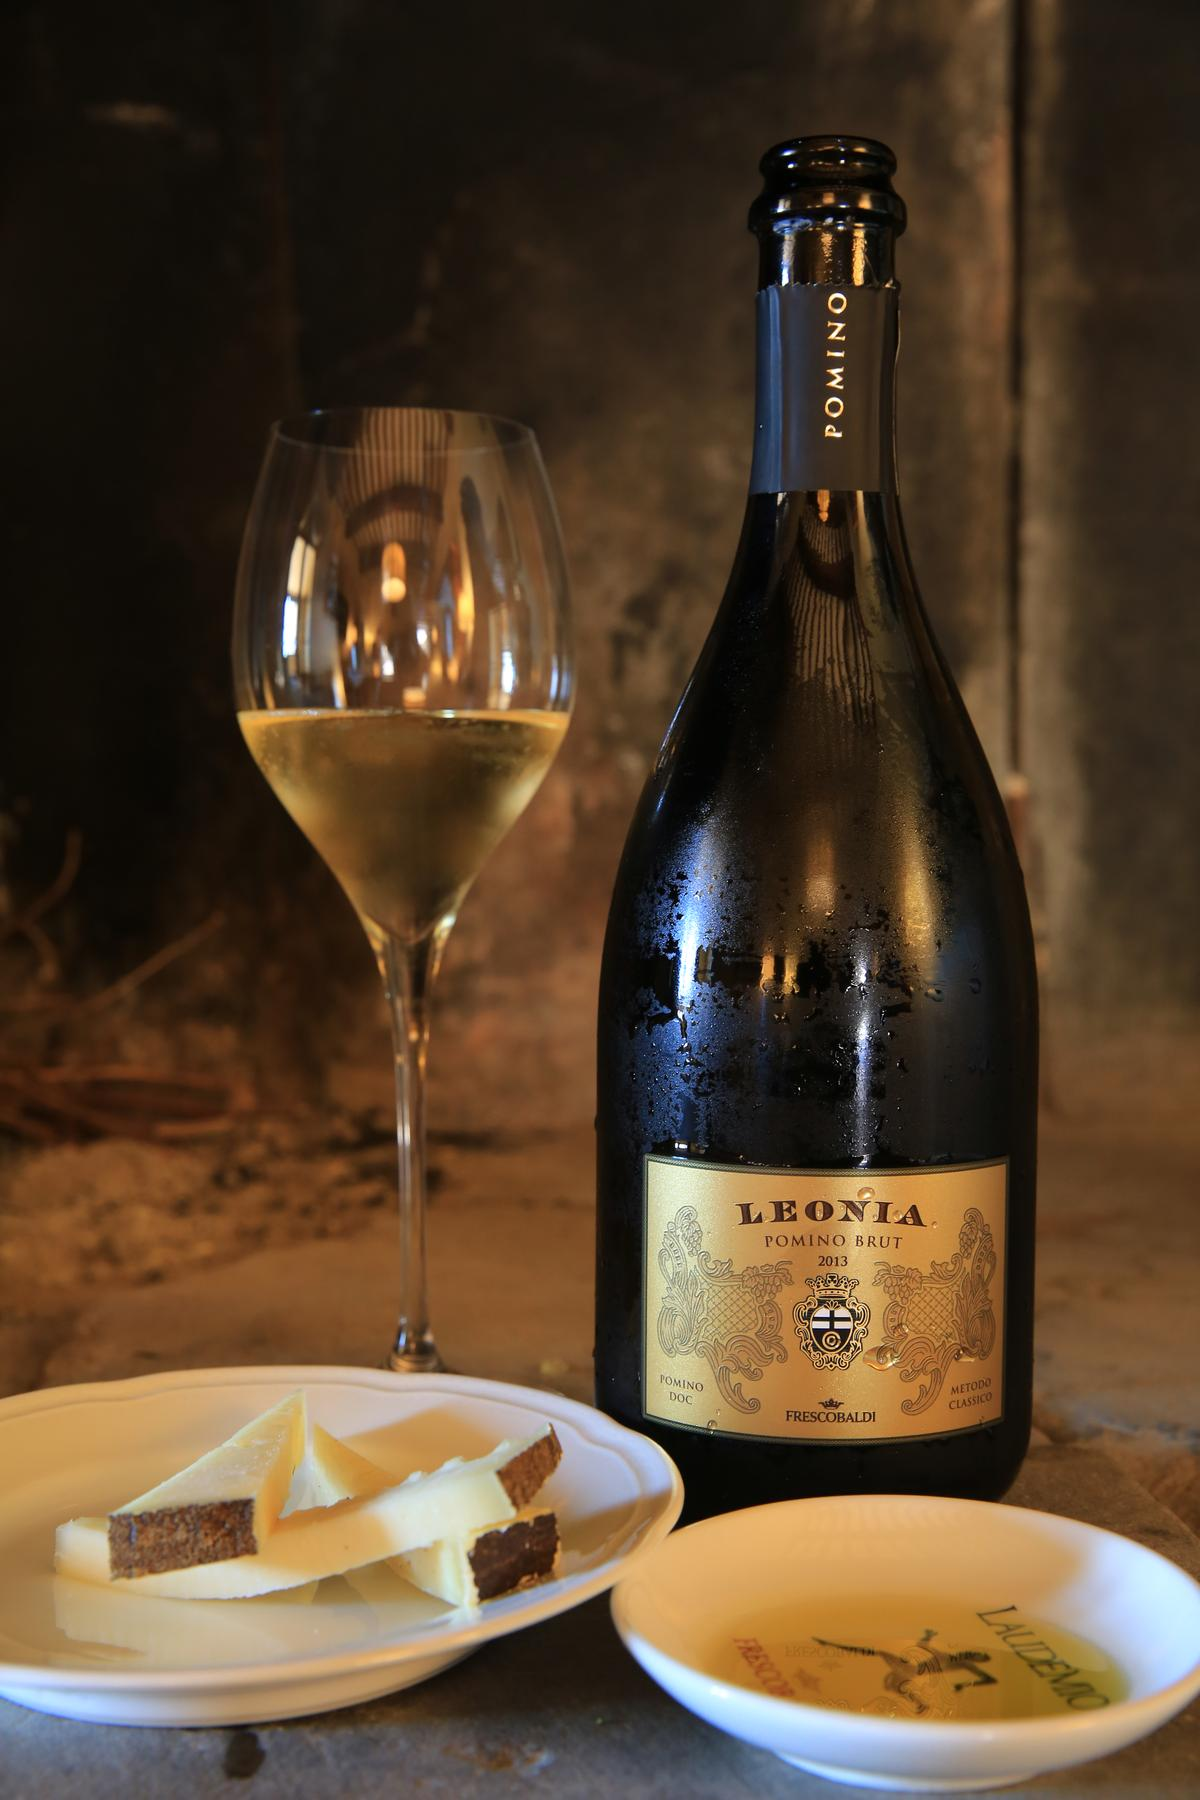 「Leonia Pomino Brut」氣泡酒是以Chardonnay與Pinot Noir發酵28個月釀製而成,口感清爽。